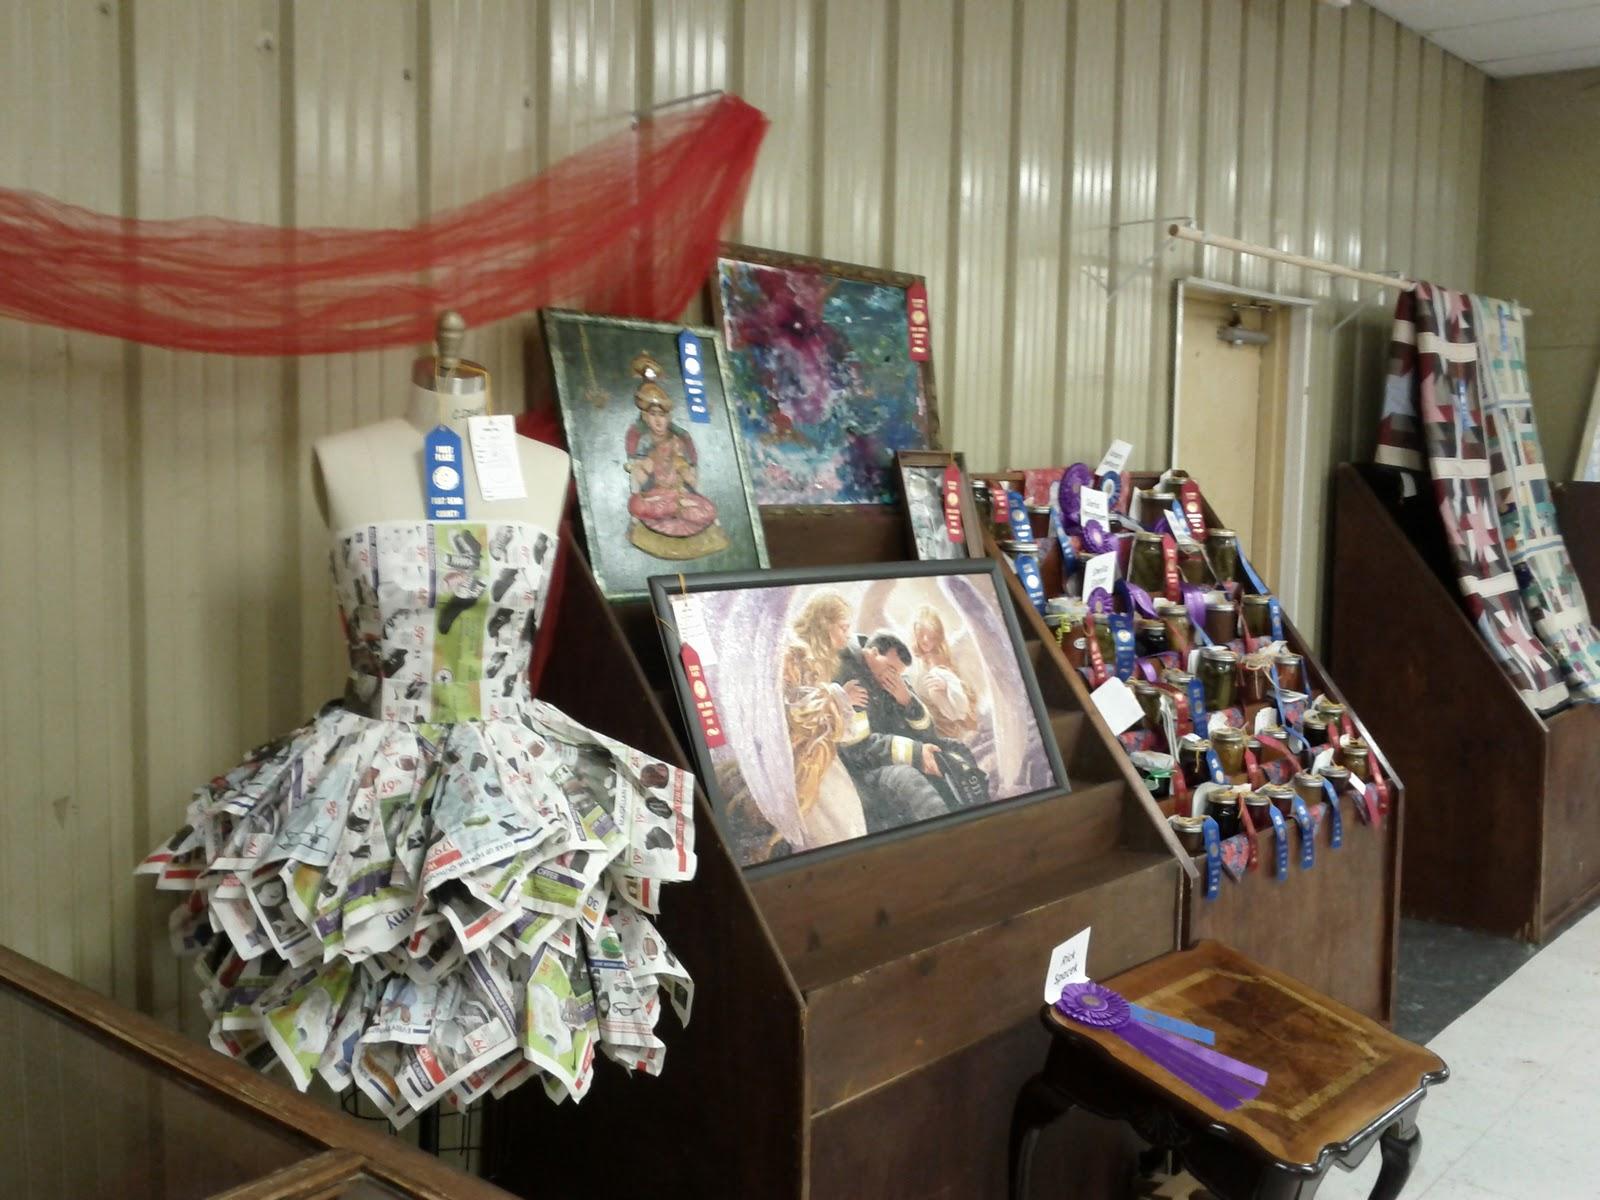 Fort Bend County Fair 2011 - IMG_20111001_180347.jpg